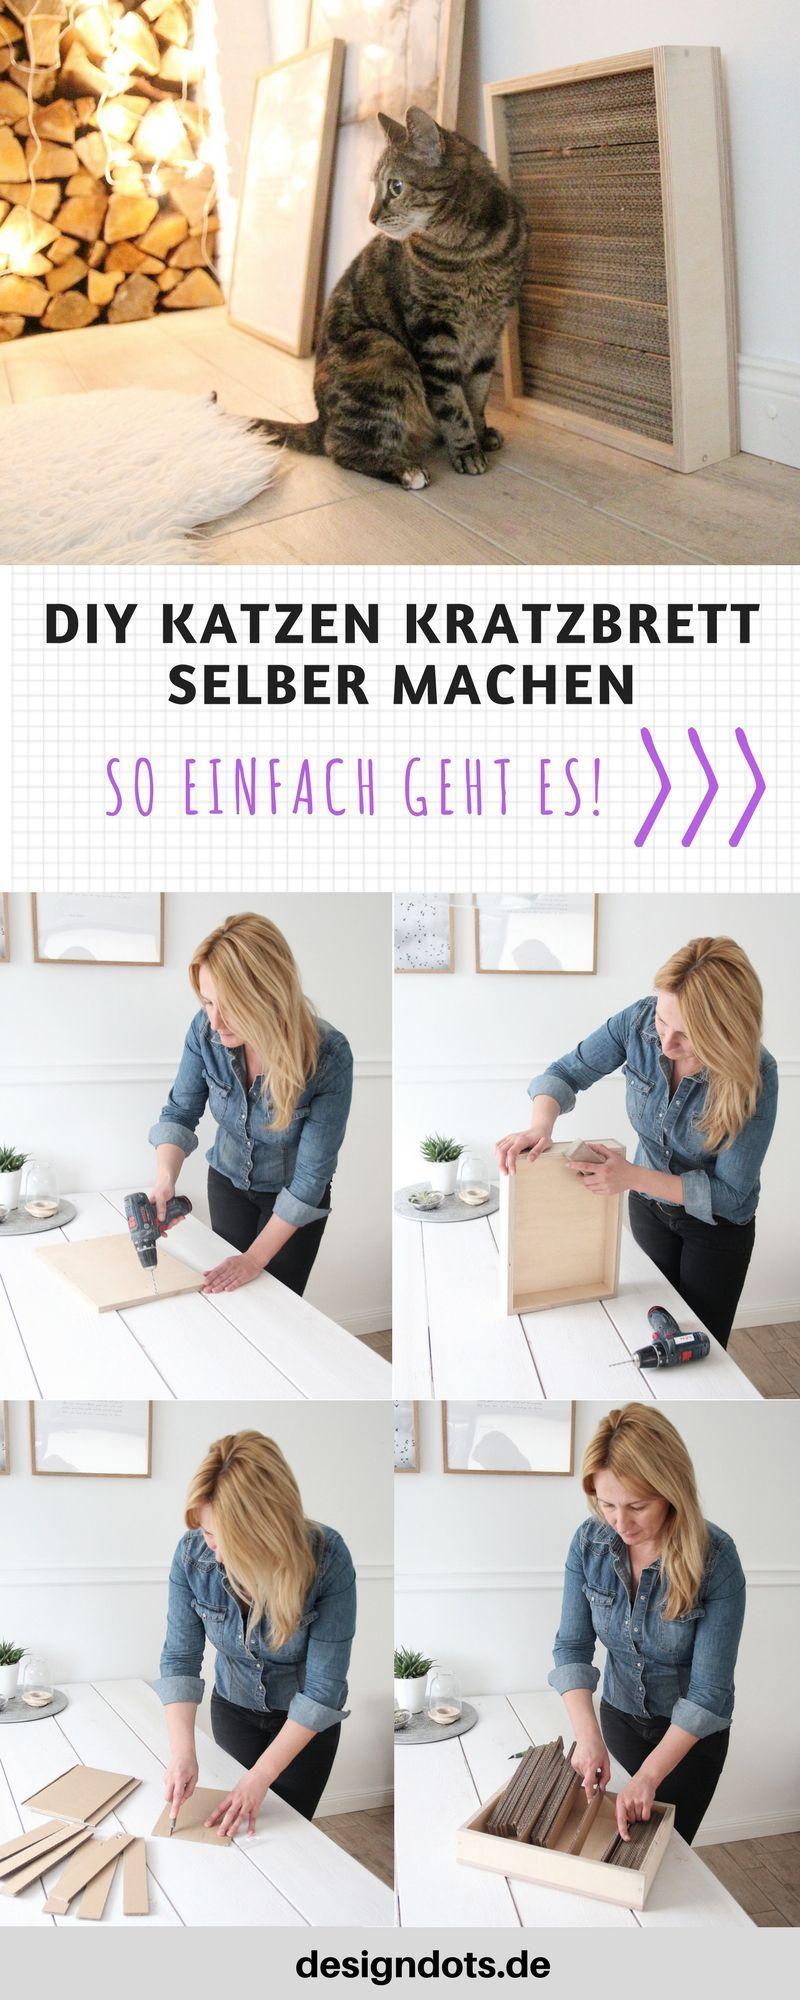 DIY Katzen Kratzbrett selber machen - DESIGN DOTS #holzbauen